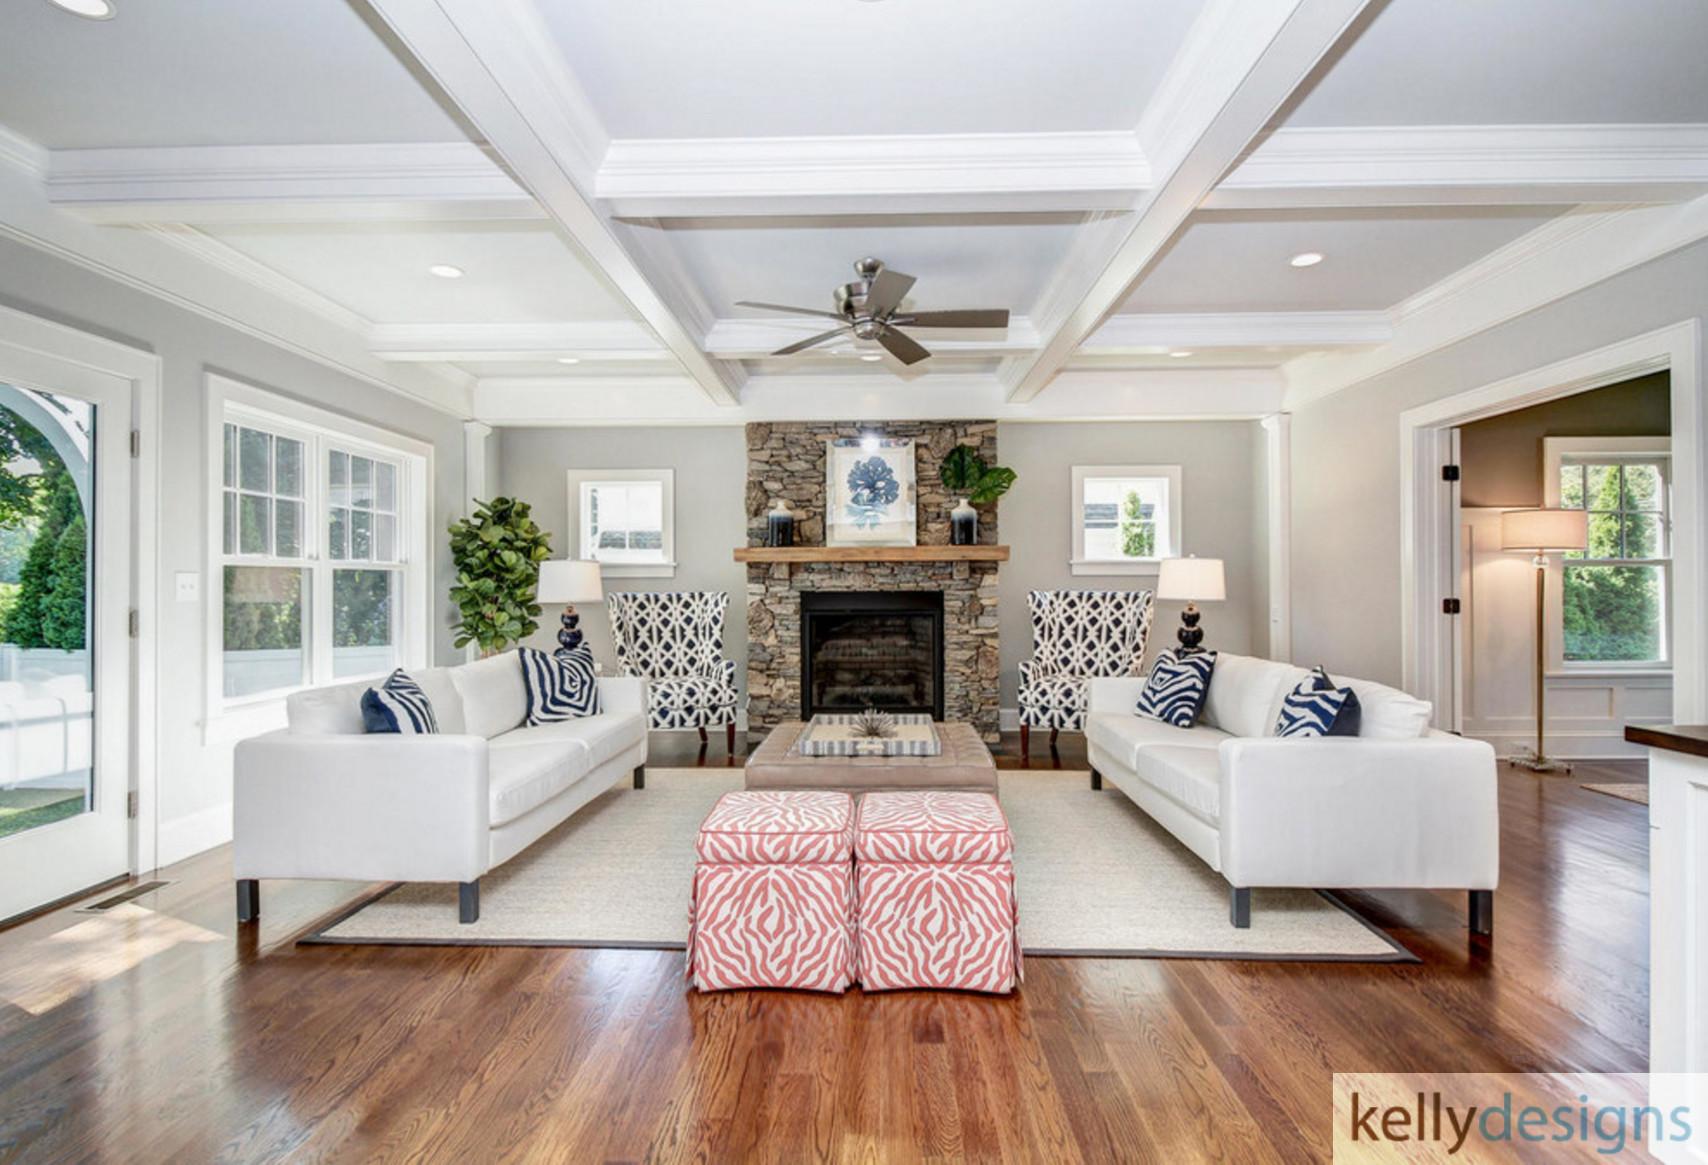 winning-on-wormwood-family-room-interior-design-by-kellydesigns